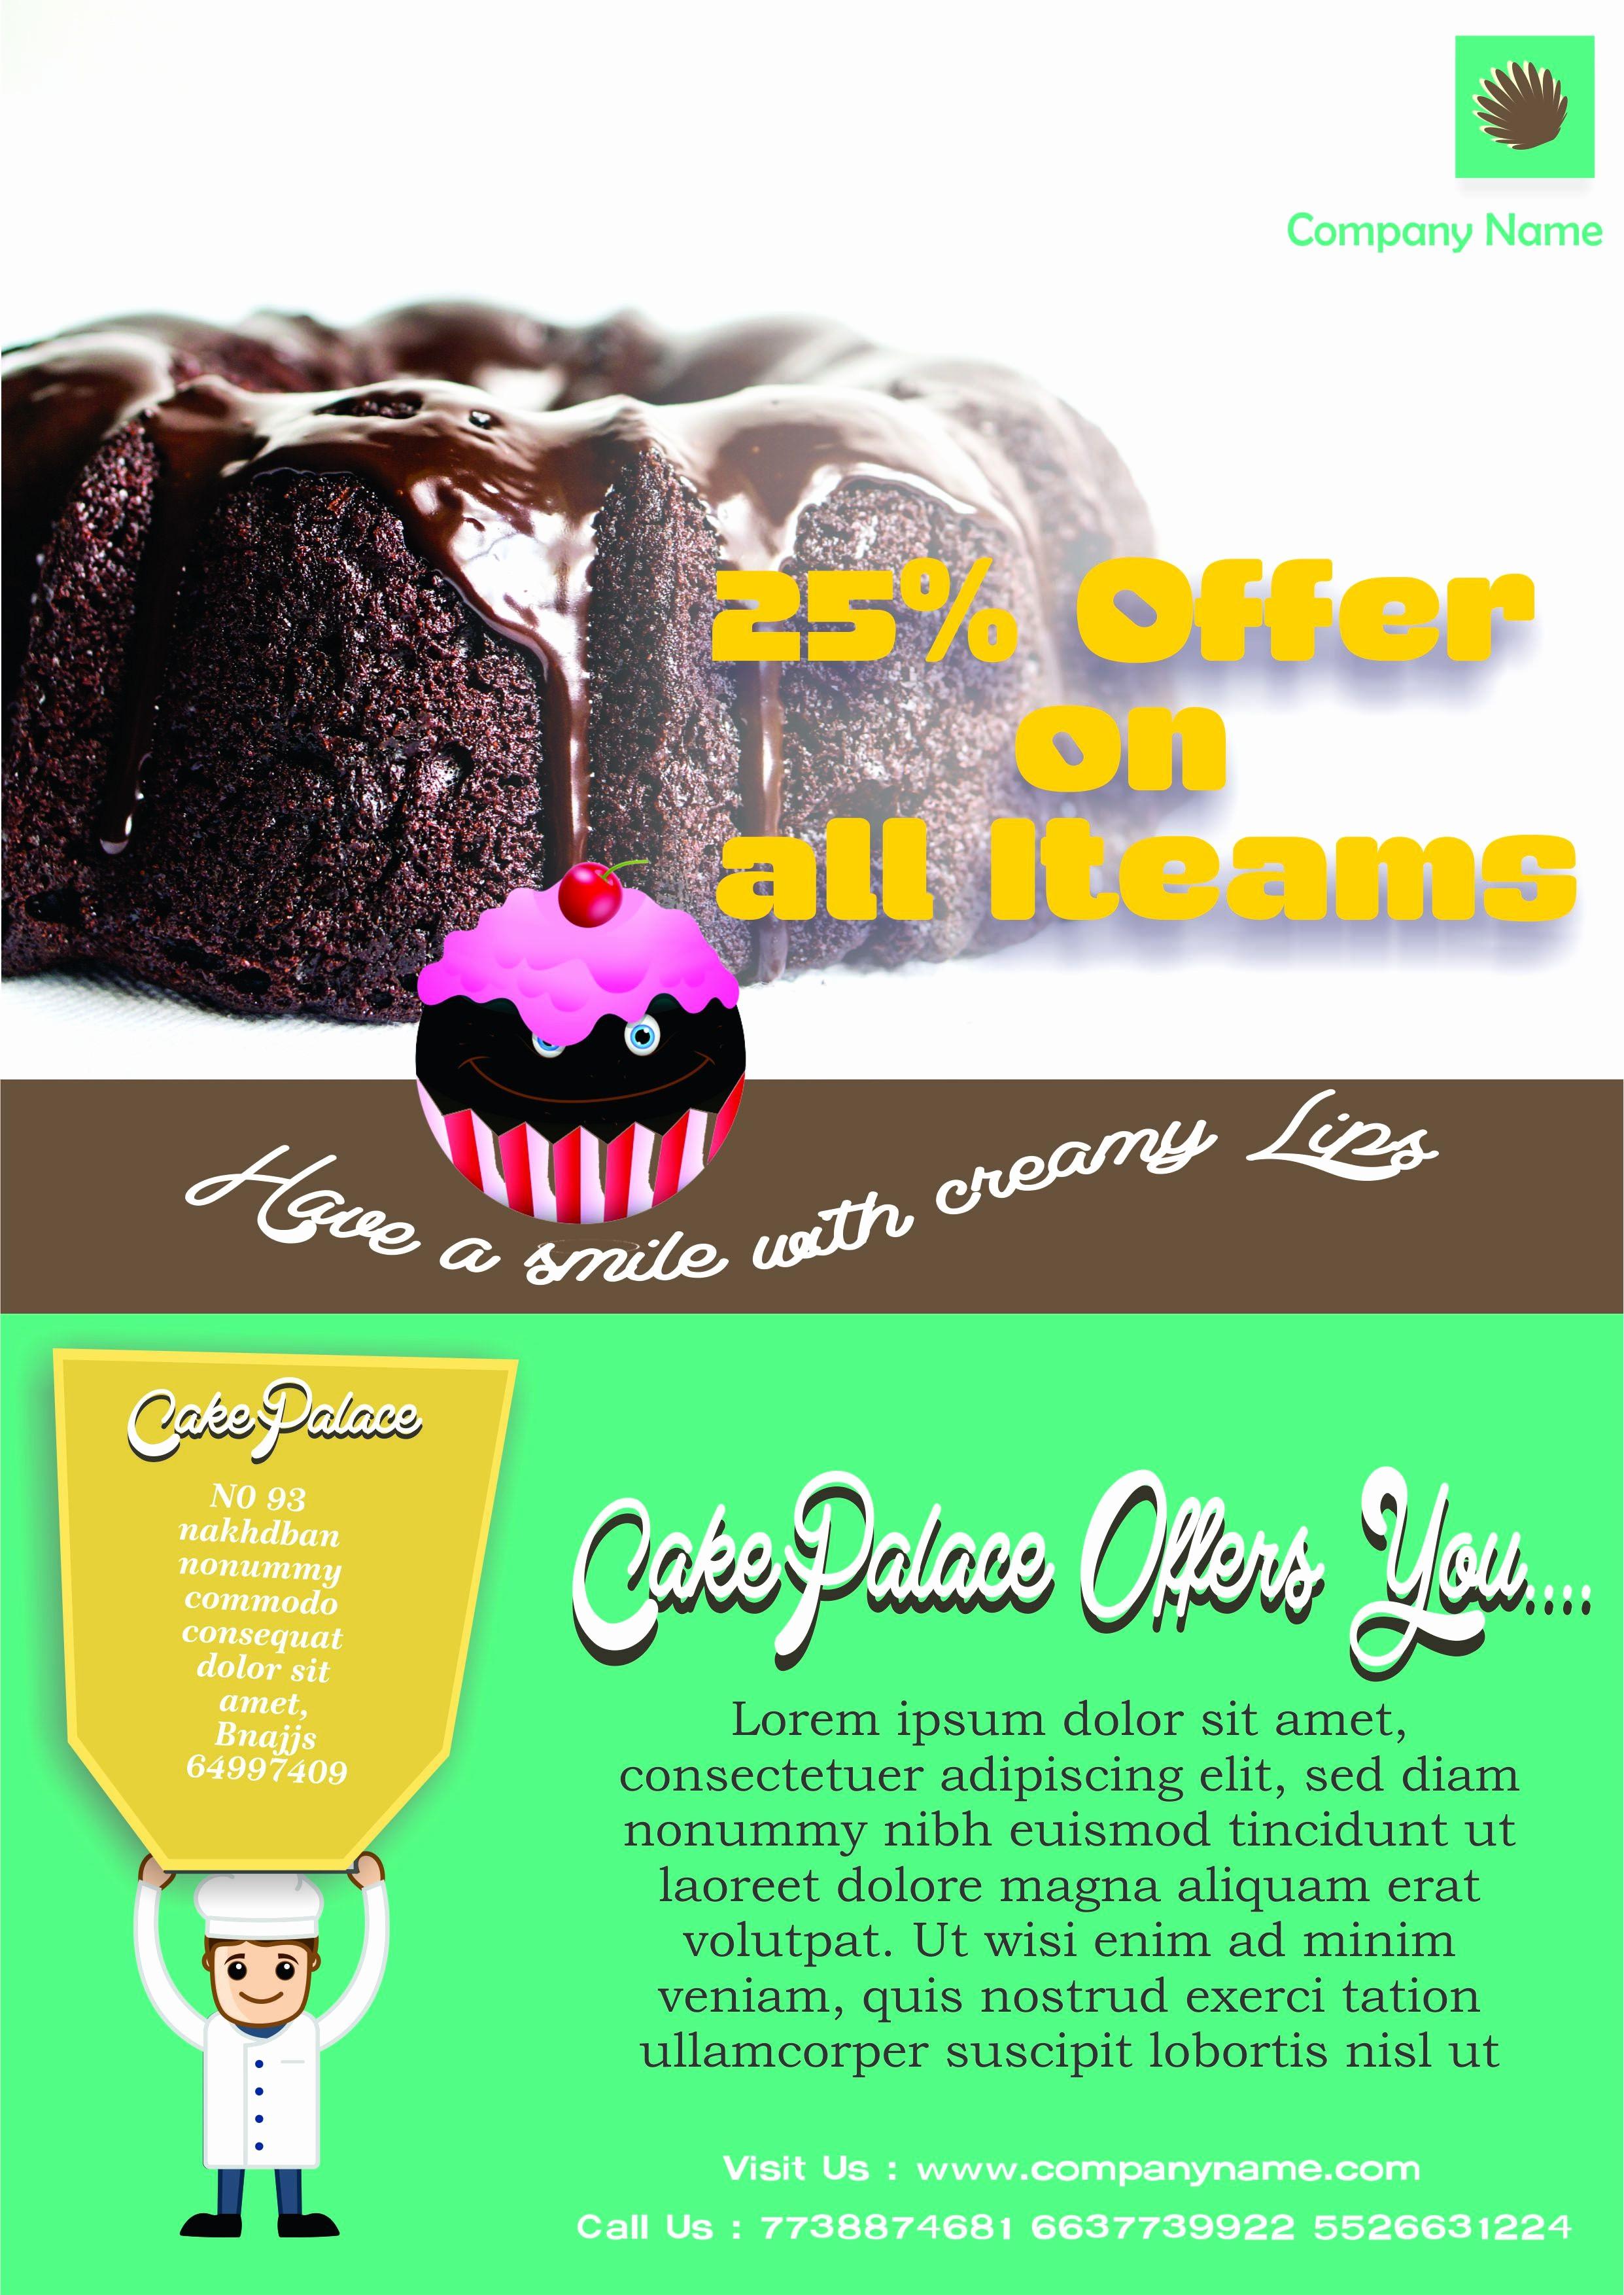 Bake Sale Flyer Template Microsoft Best Of Engaging Free Bake Sale Flyer Templates for Fundraising